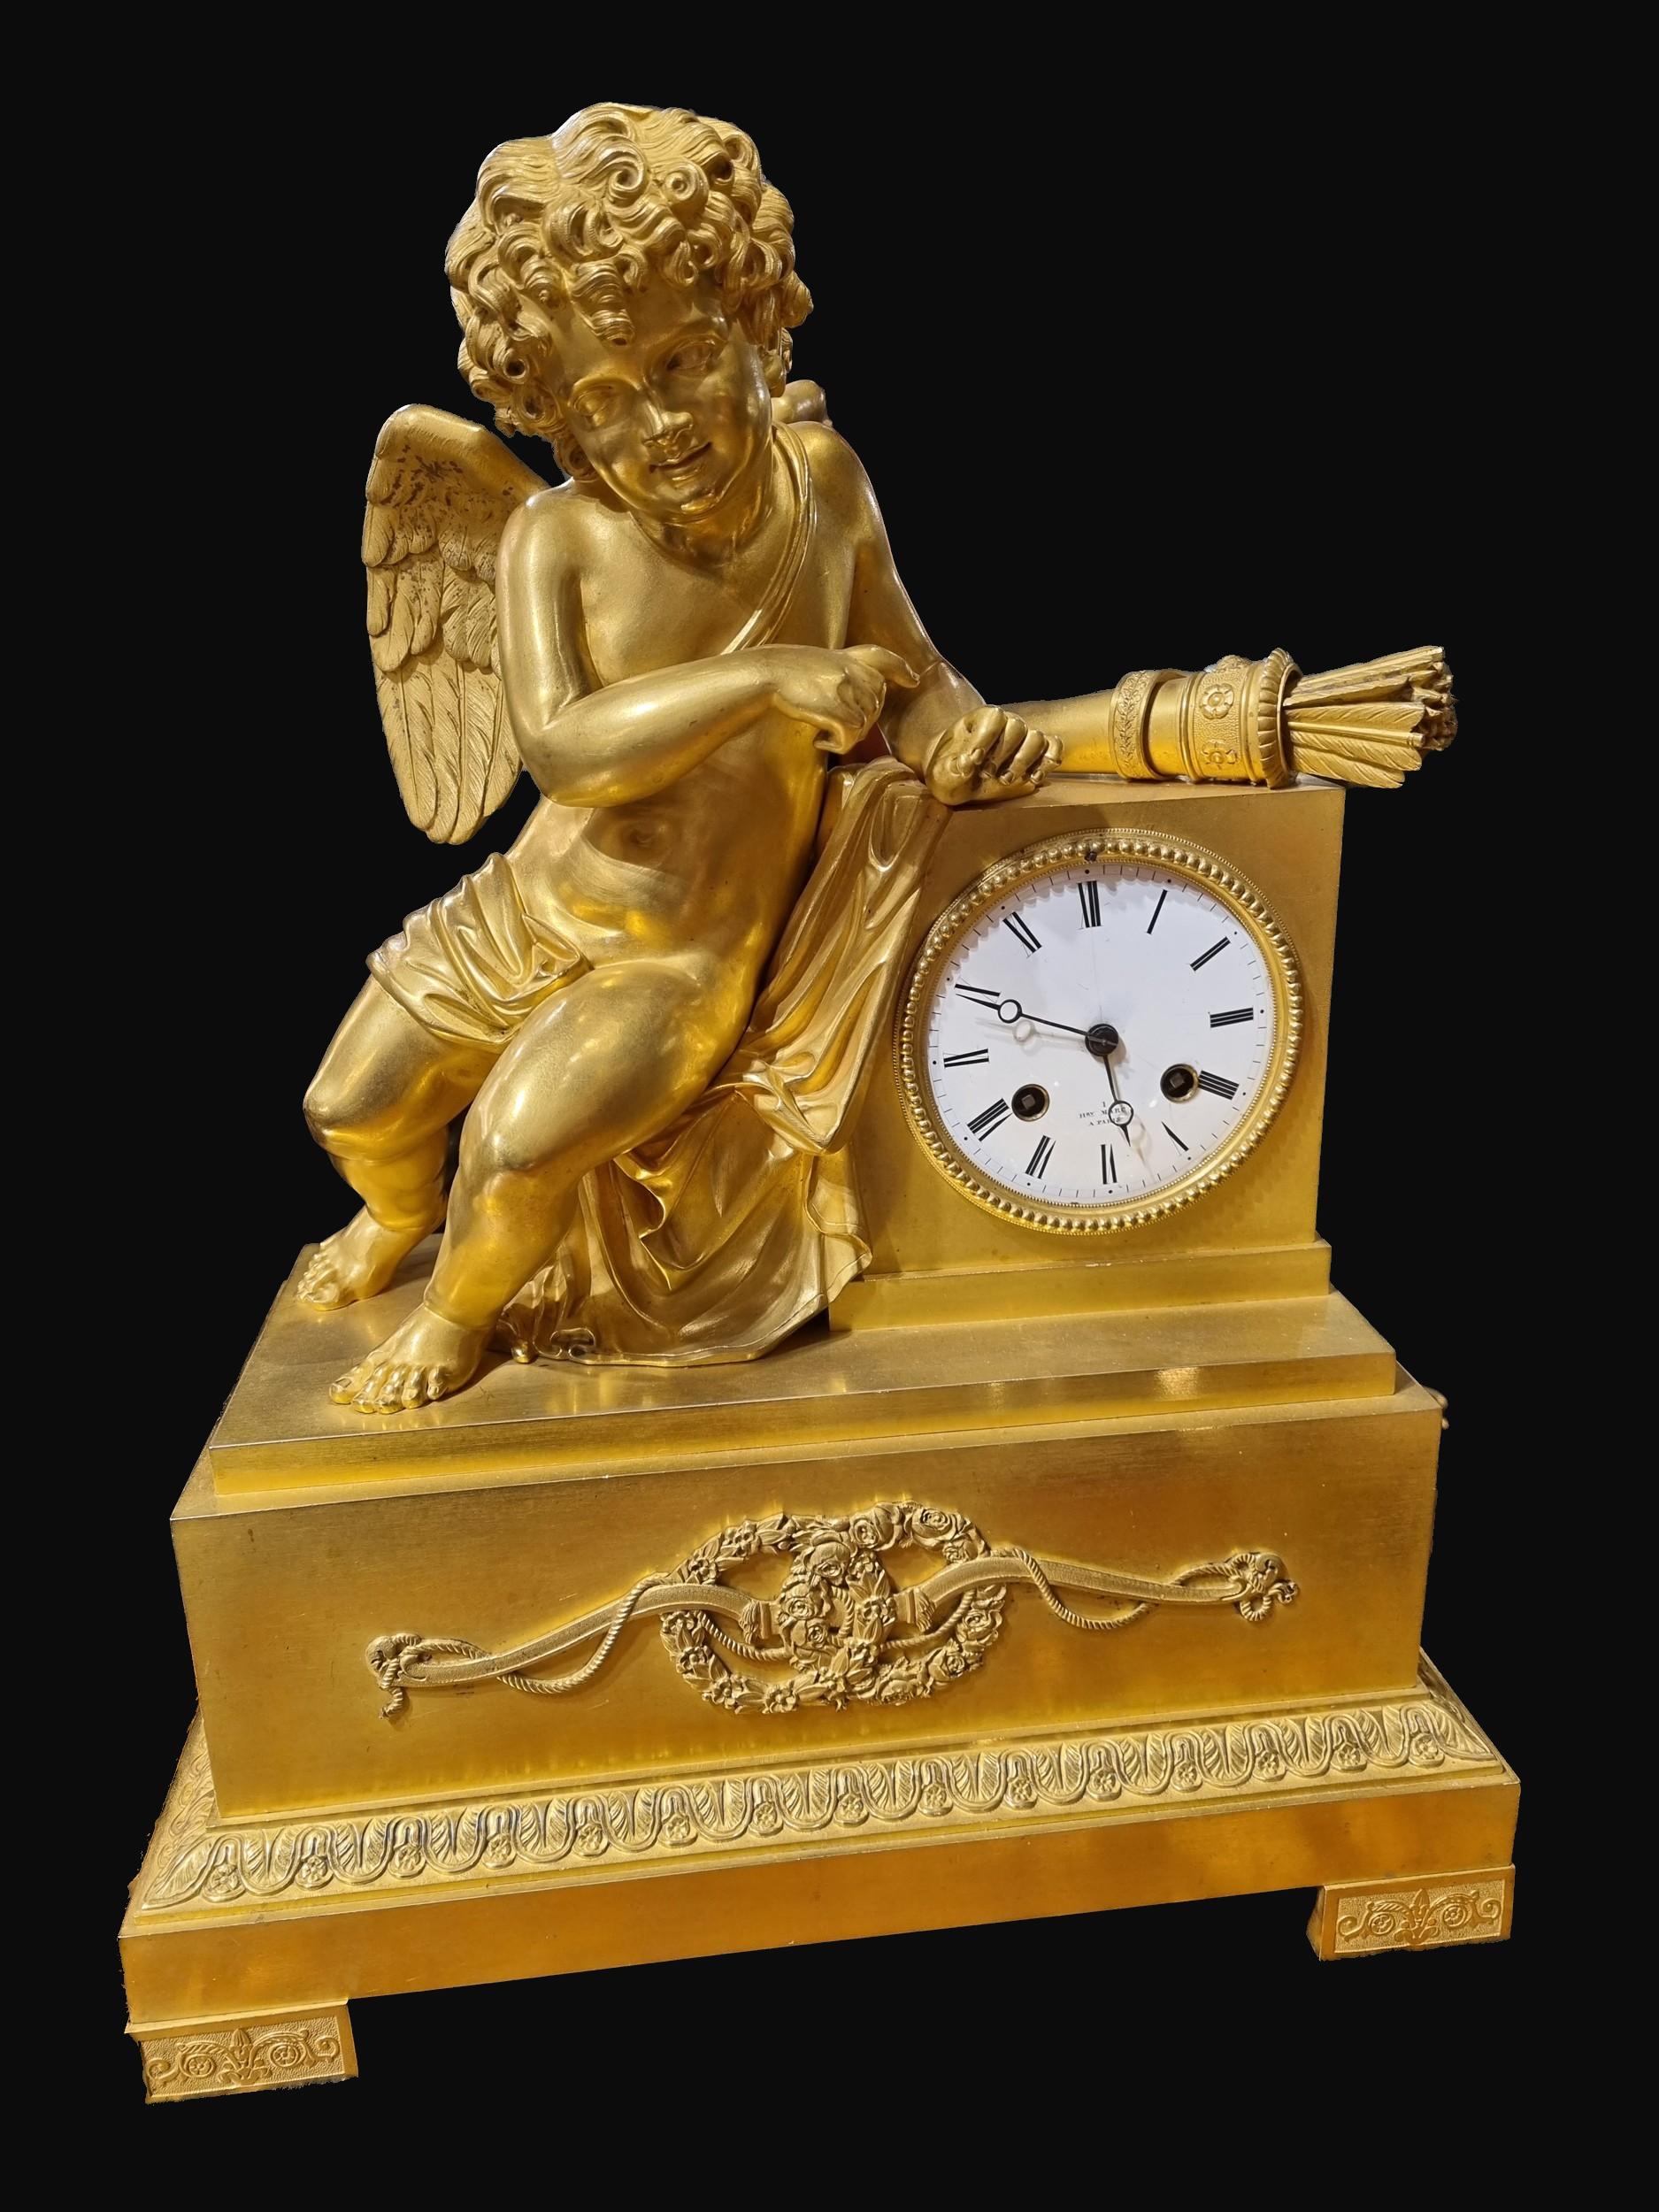 A Fine C19th Gilt Metal Cupid Mantel Clock by Henry Marc